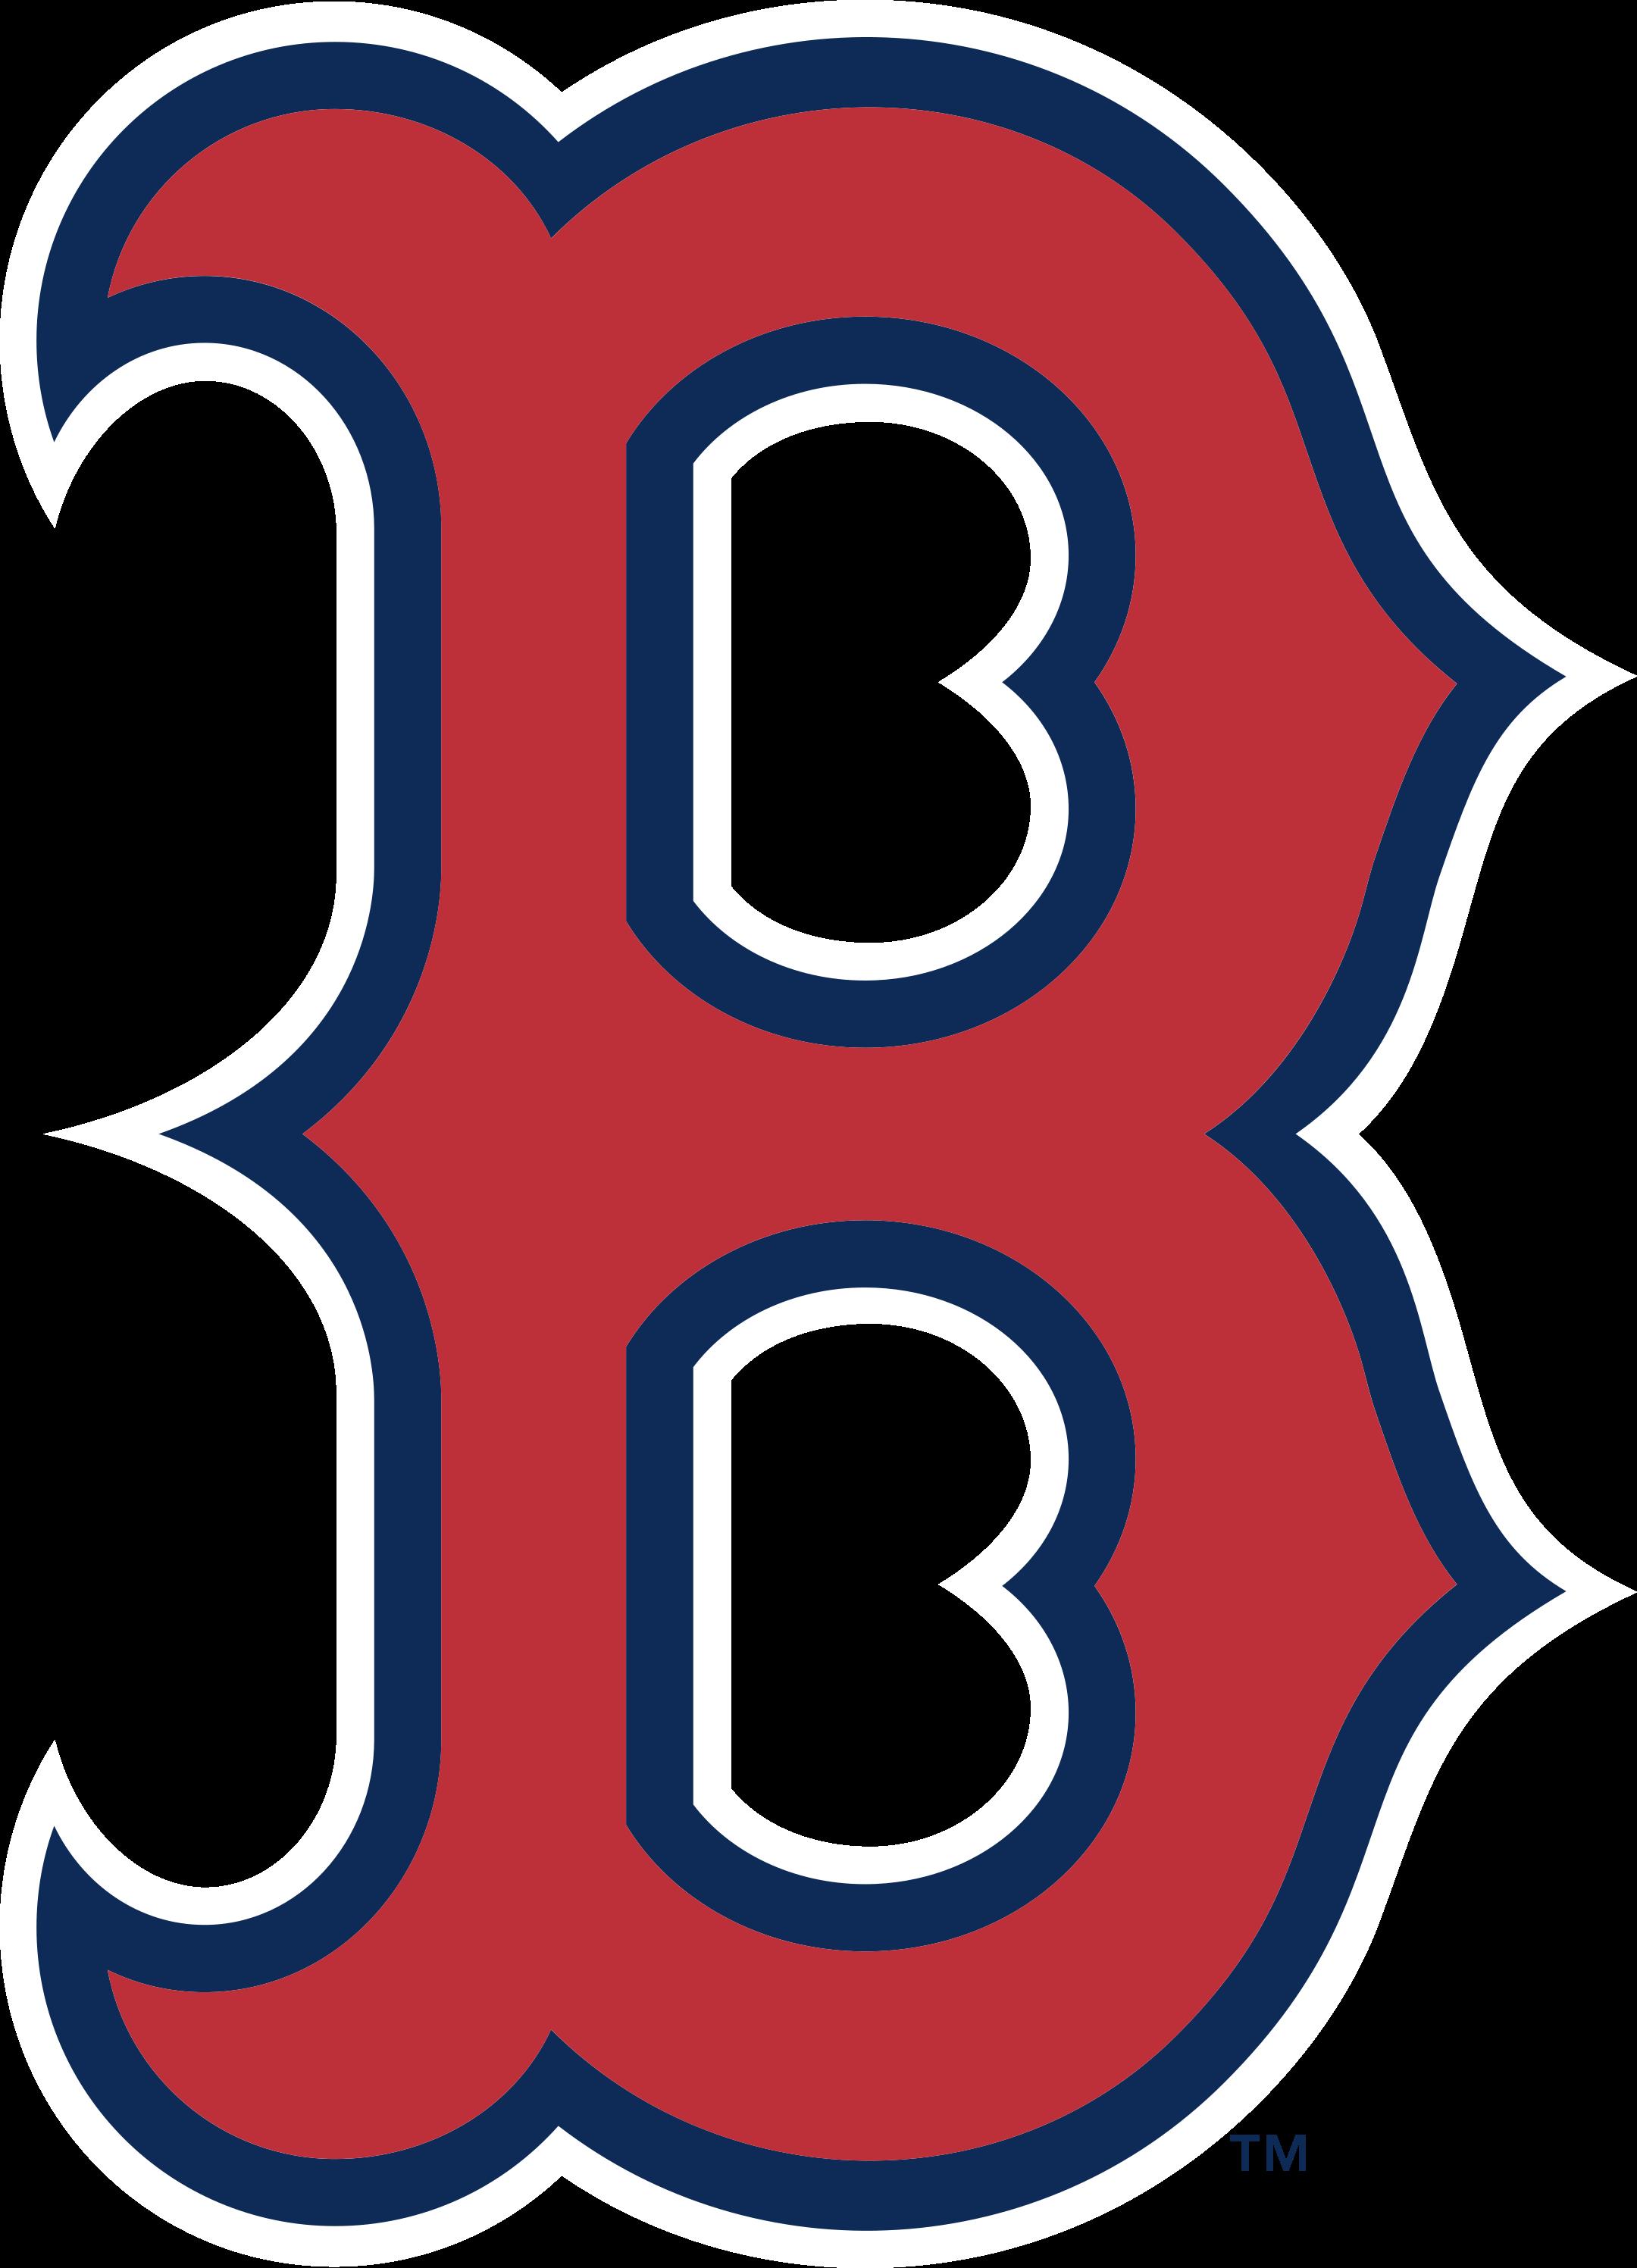 boston red sox logo 1 - Boston Red Sox Logo